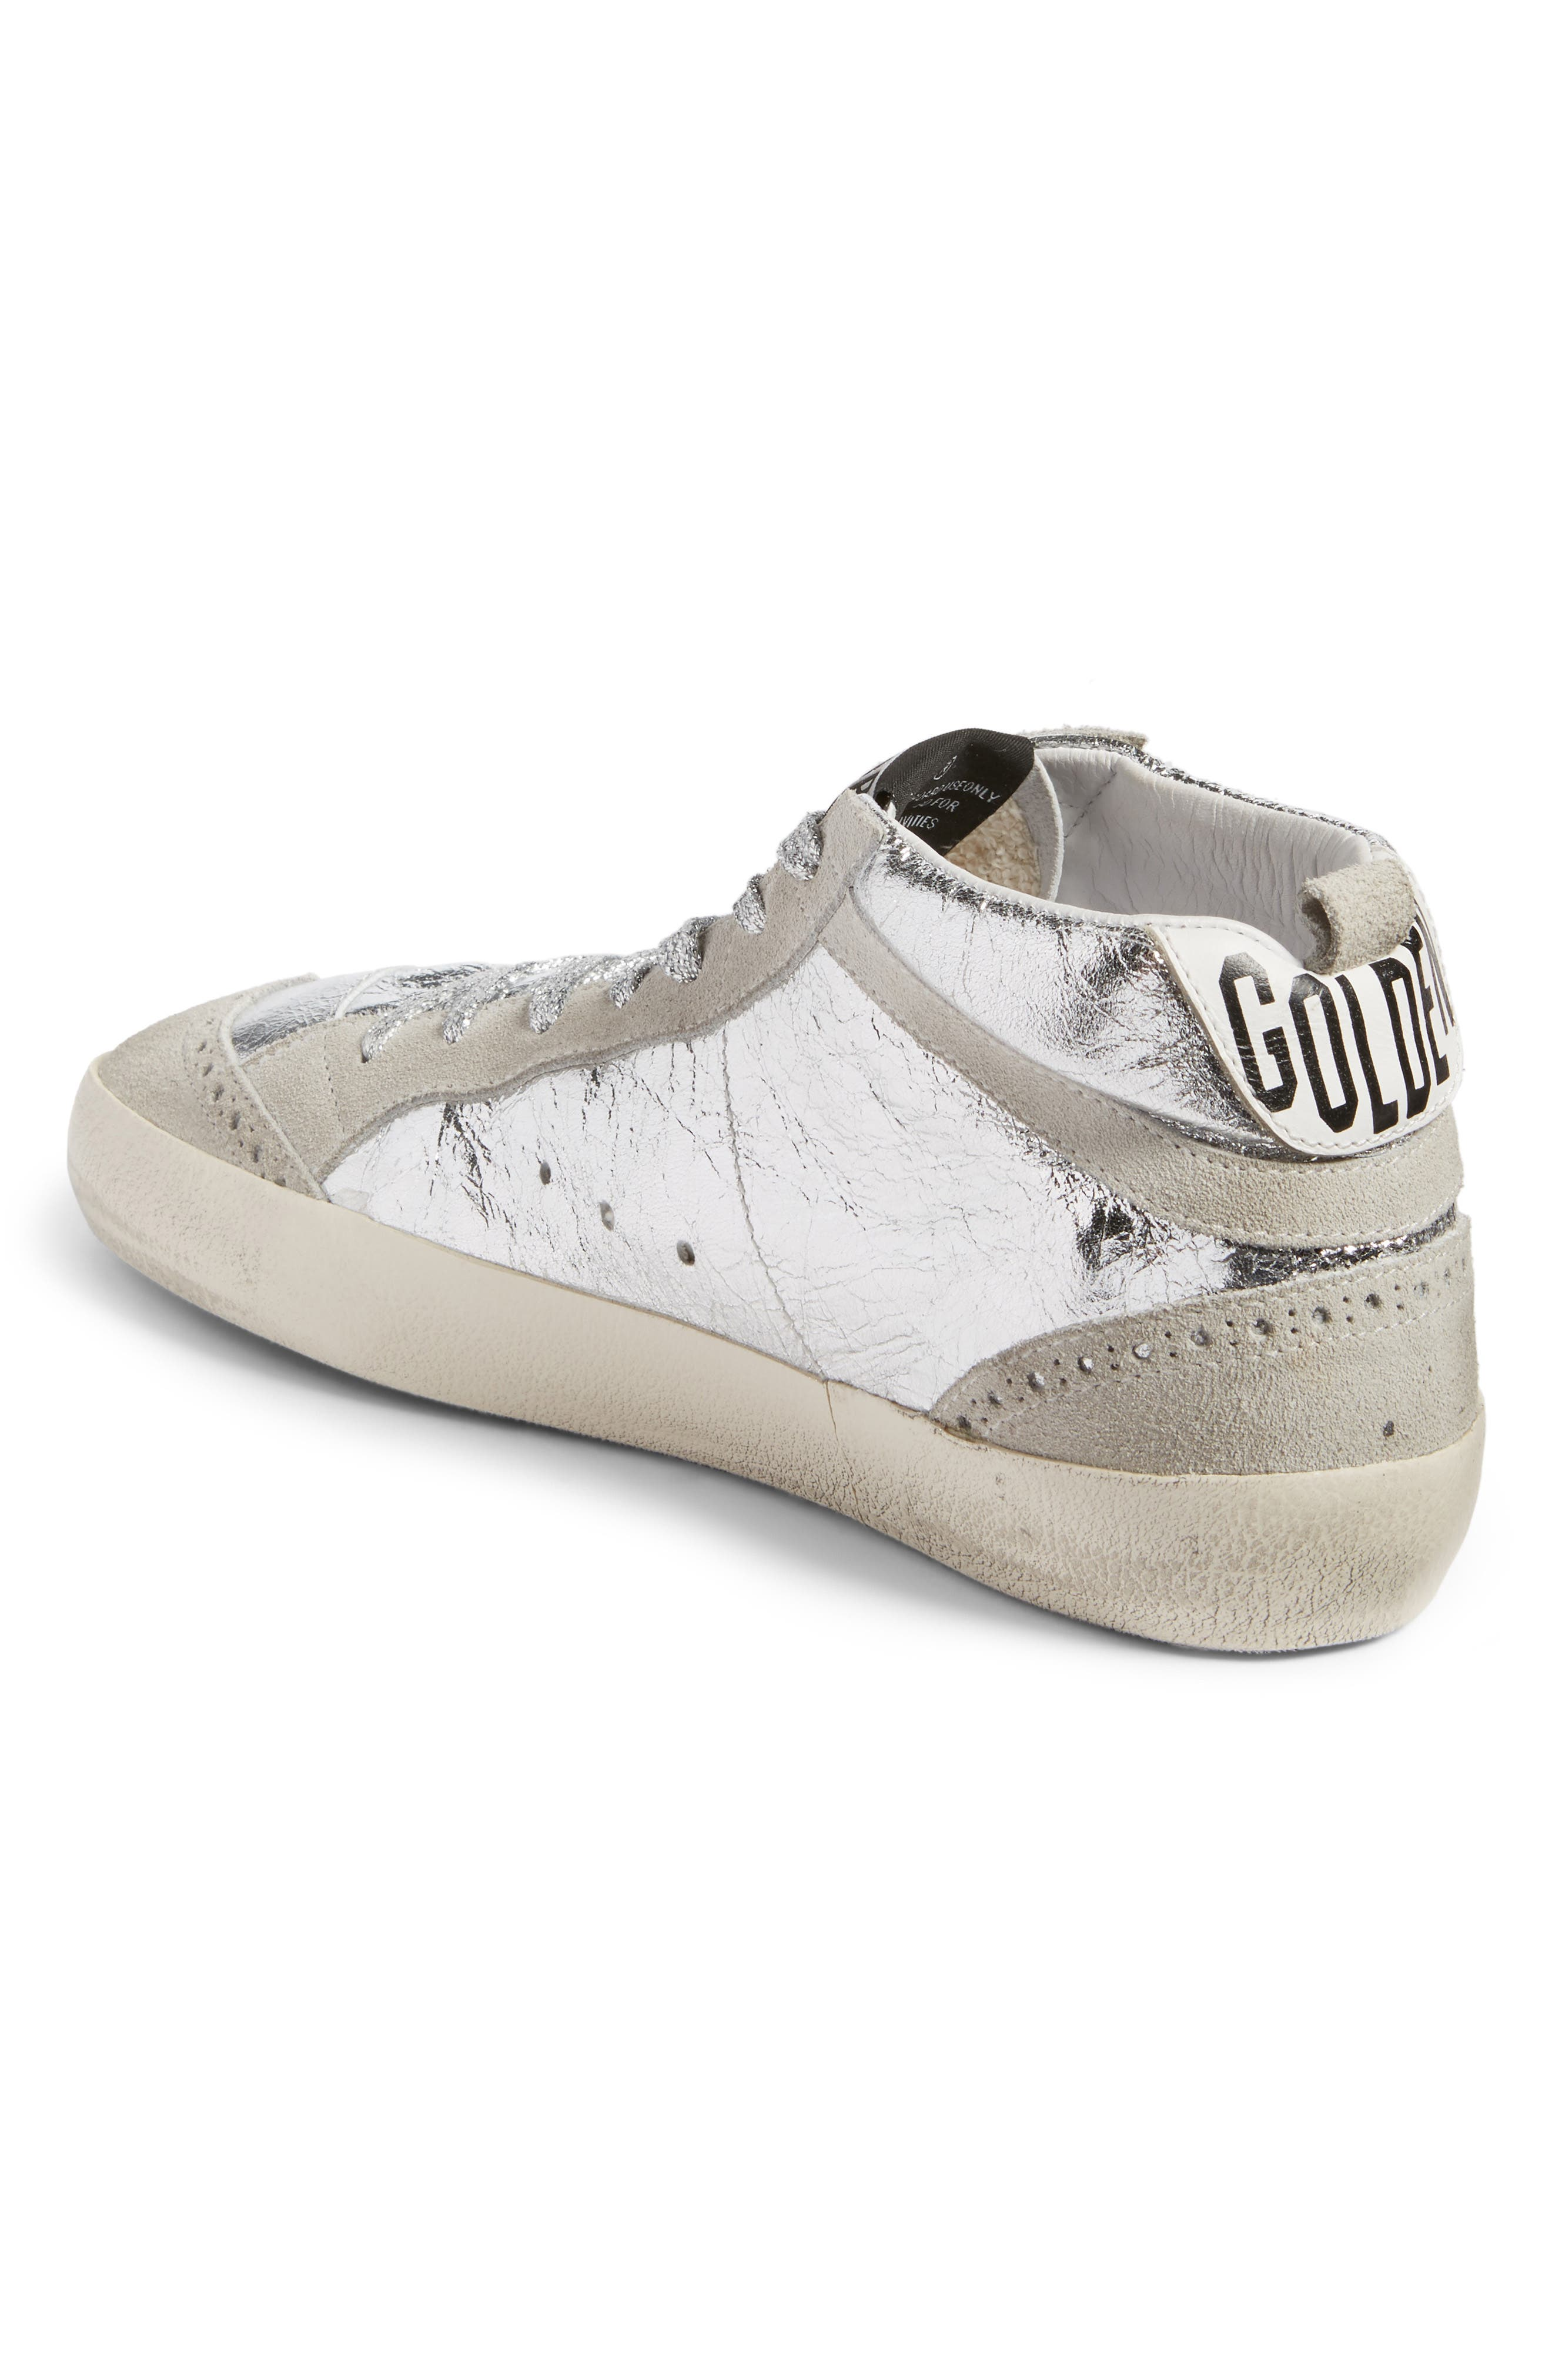 Alternate Image 2  - Golden Goose Mid Star Metallic Sneaker (Women)